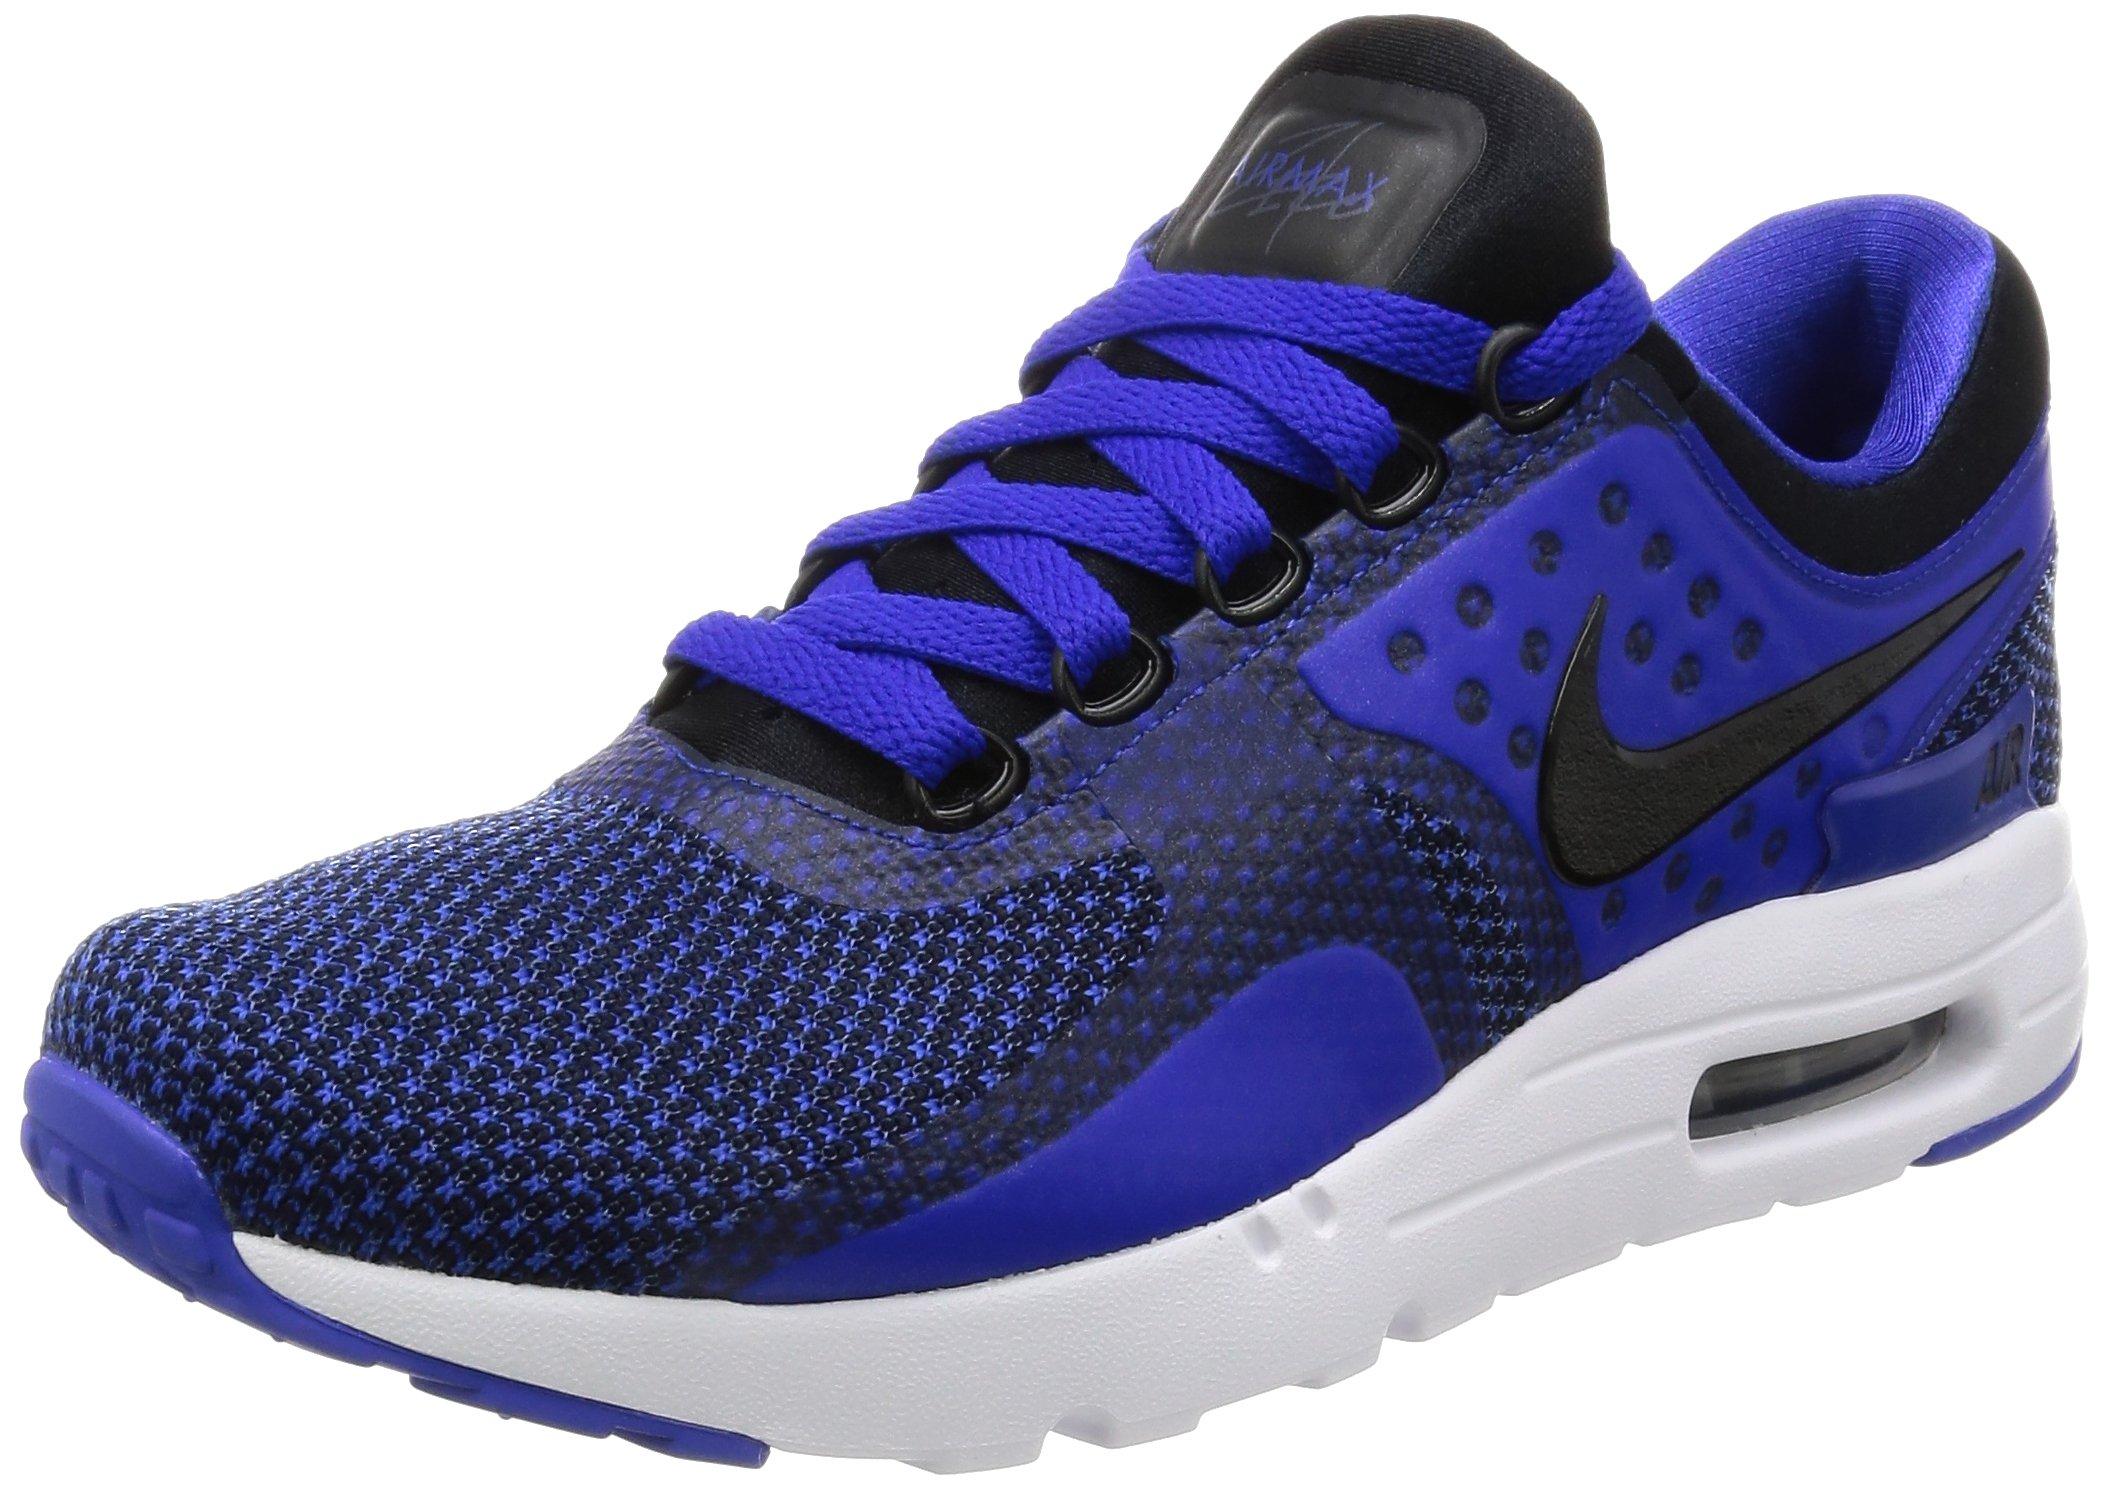 brand new 28cfa 91878 Galleon - Nike Air Max Zero Essential Men s Shoes Black Blue White 876070- 001 (11.5 D(M) US)